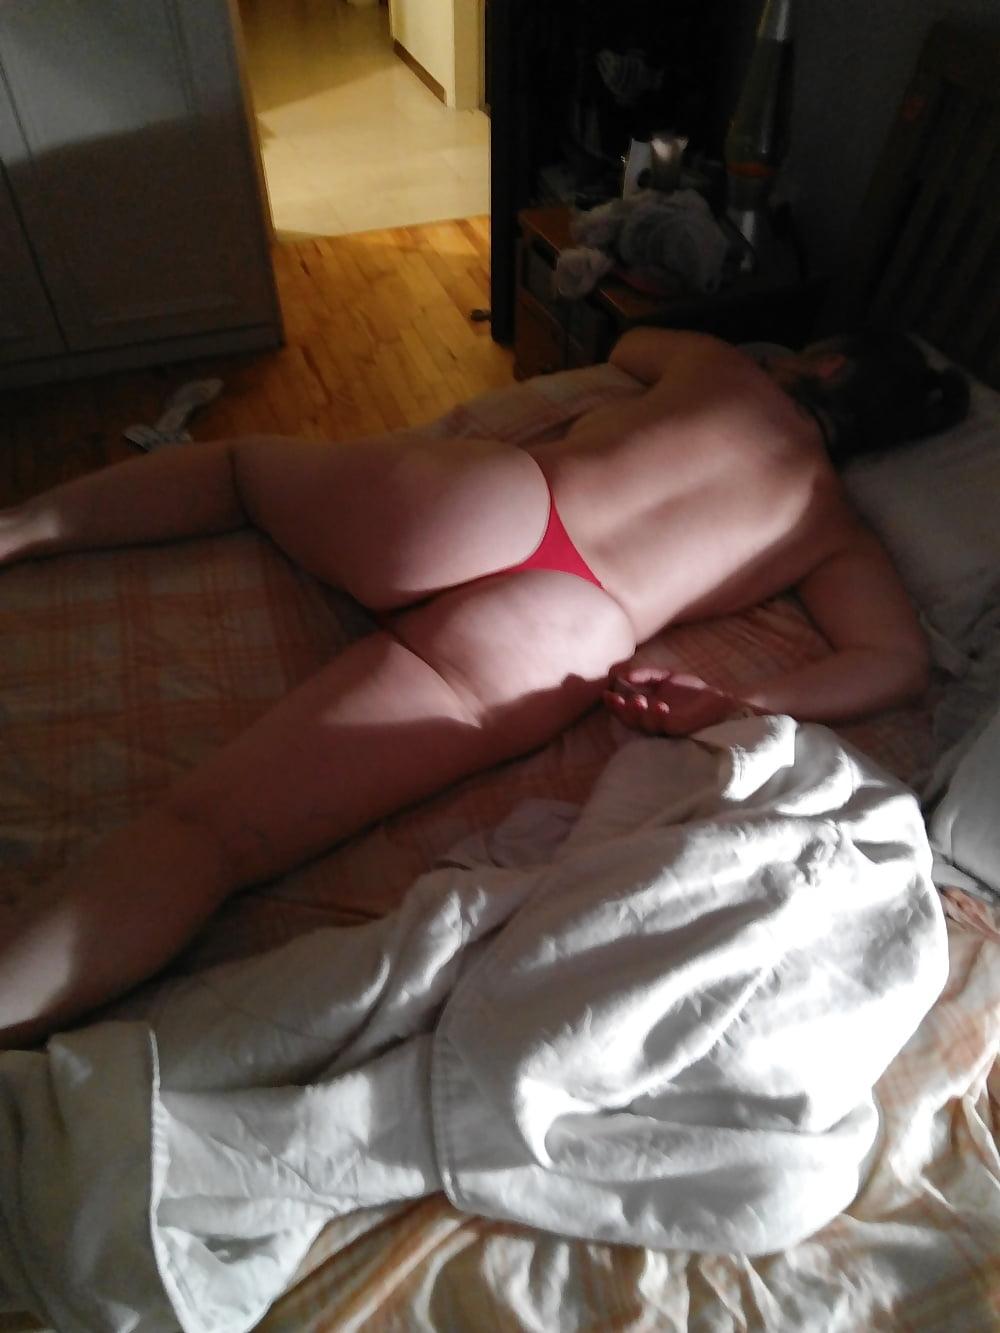 Accidental big boob slip